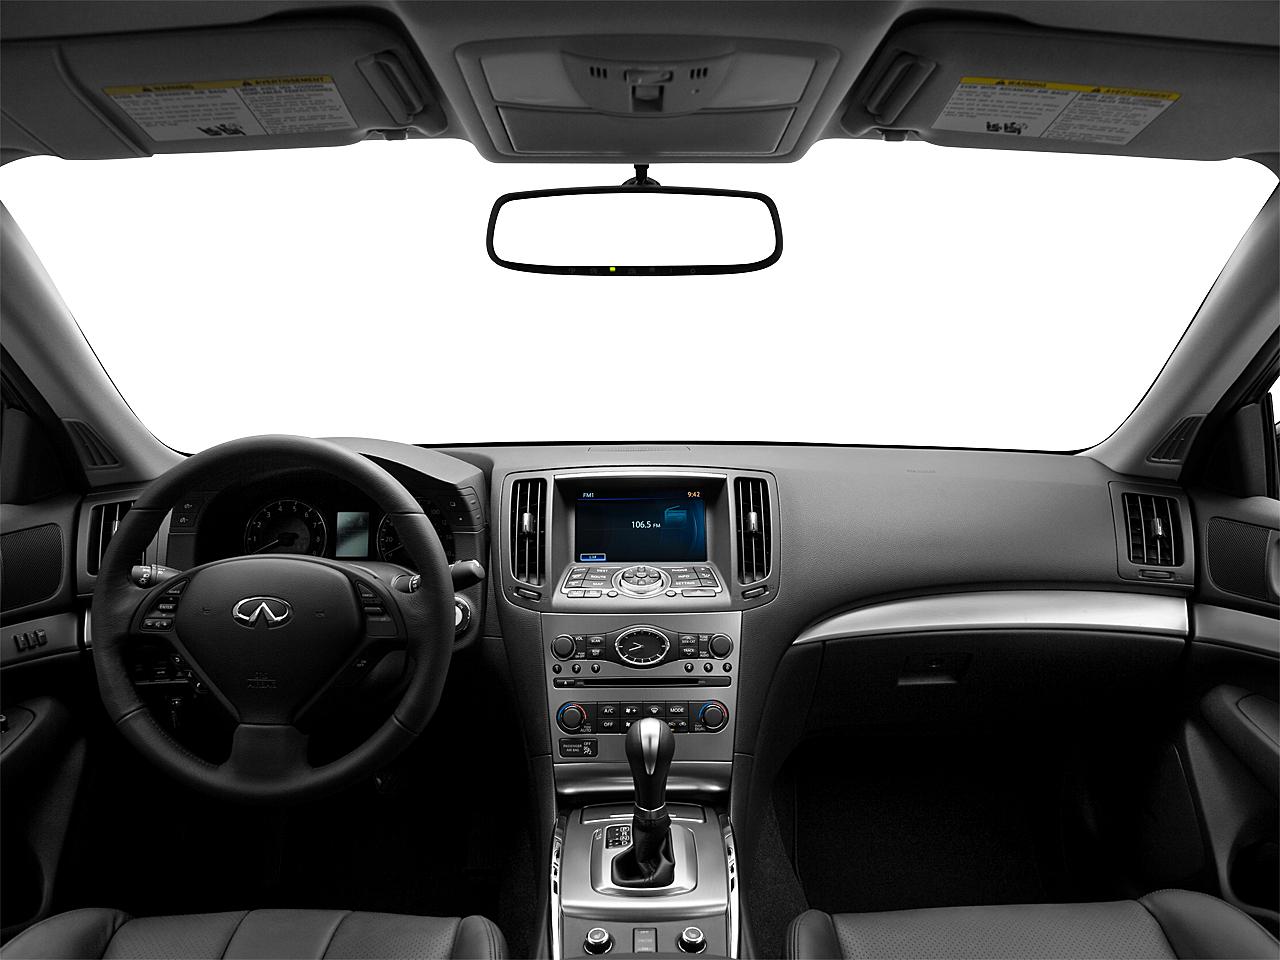 2010 Infiniti G37 Sedan Awd X Anniversary Edition 4dr Sedan Research Groovecar